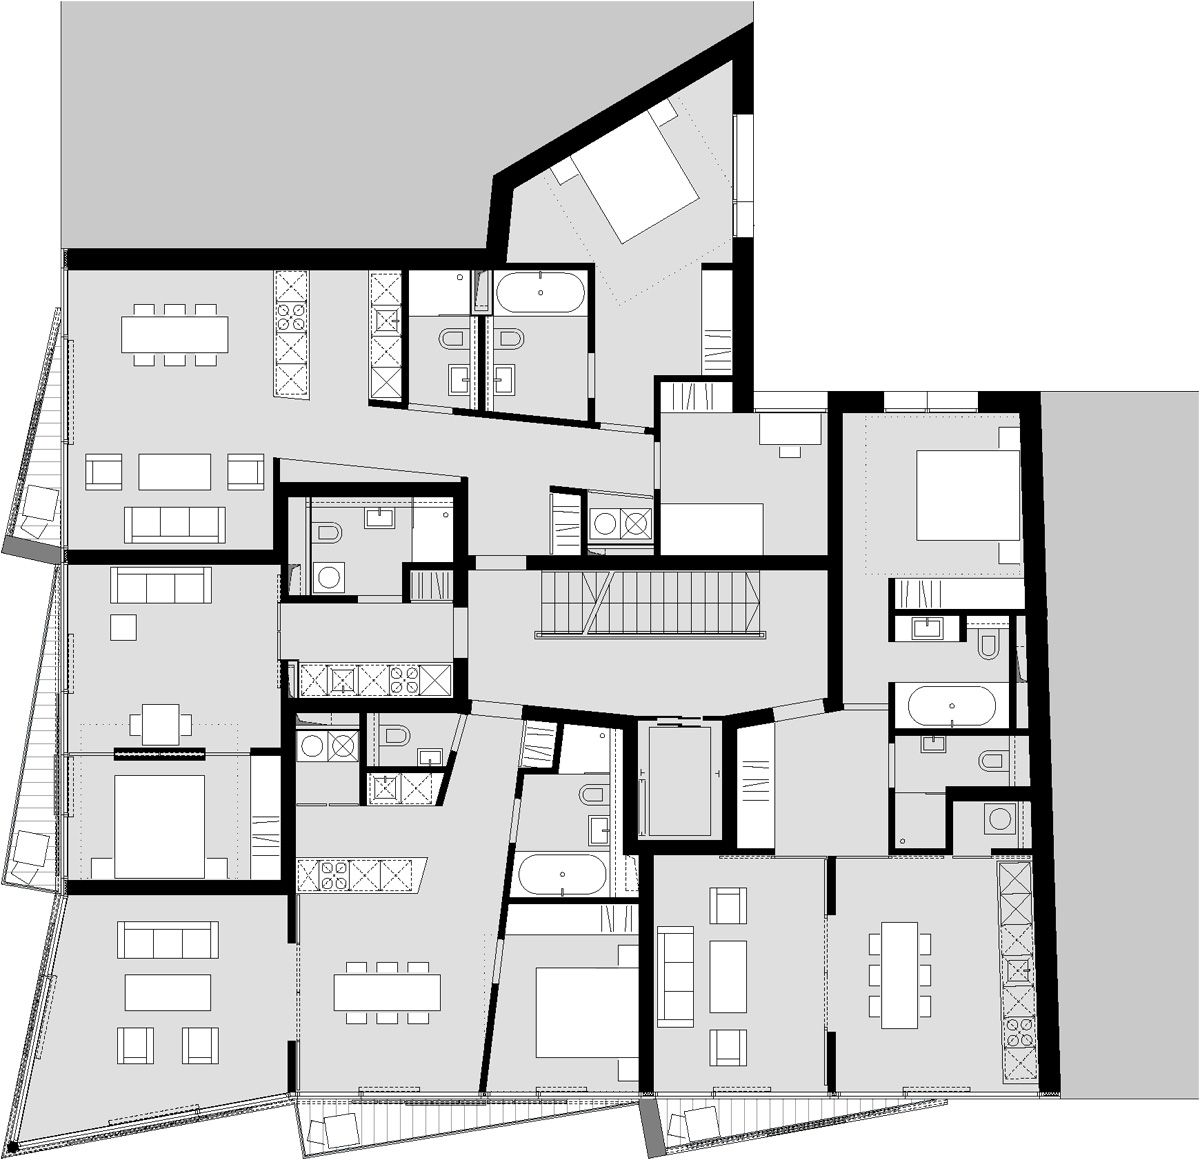 grundriss regelgeschoss michels architekturb ro gmbh residental pinterest grundrisse. Black Bedroom Furniture Sets. Home Design Ideas